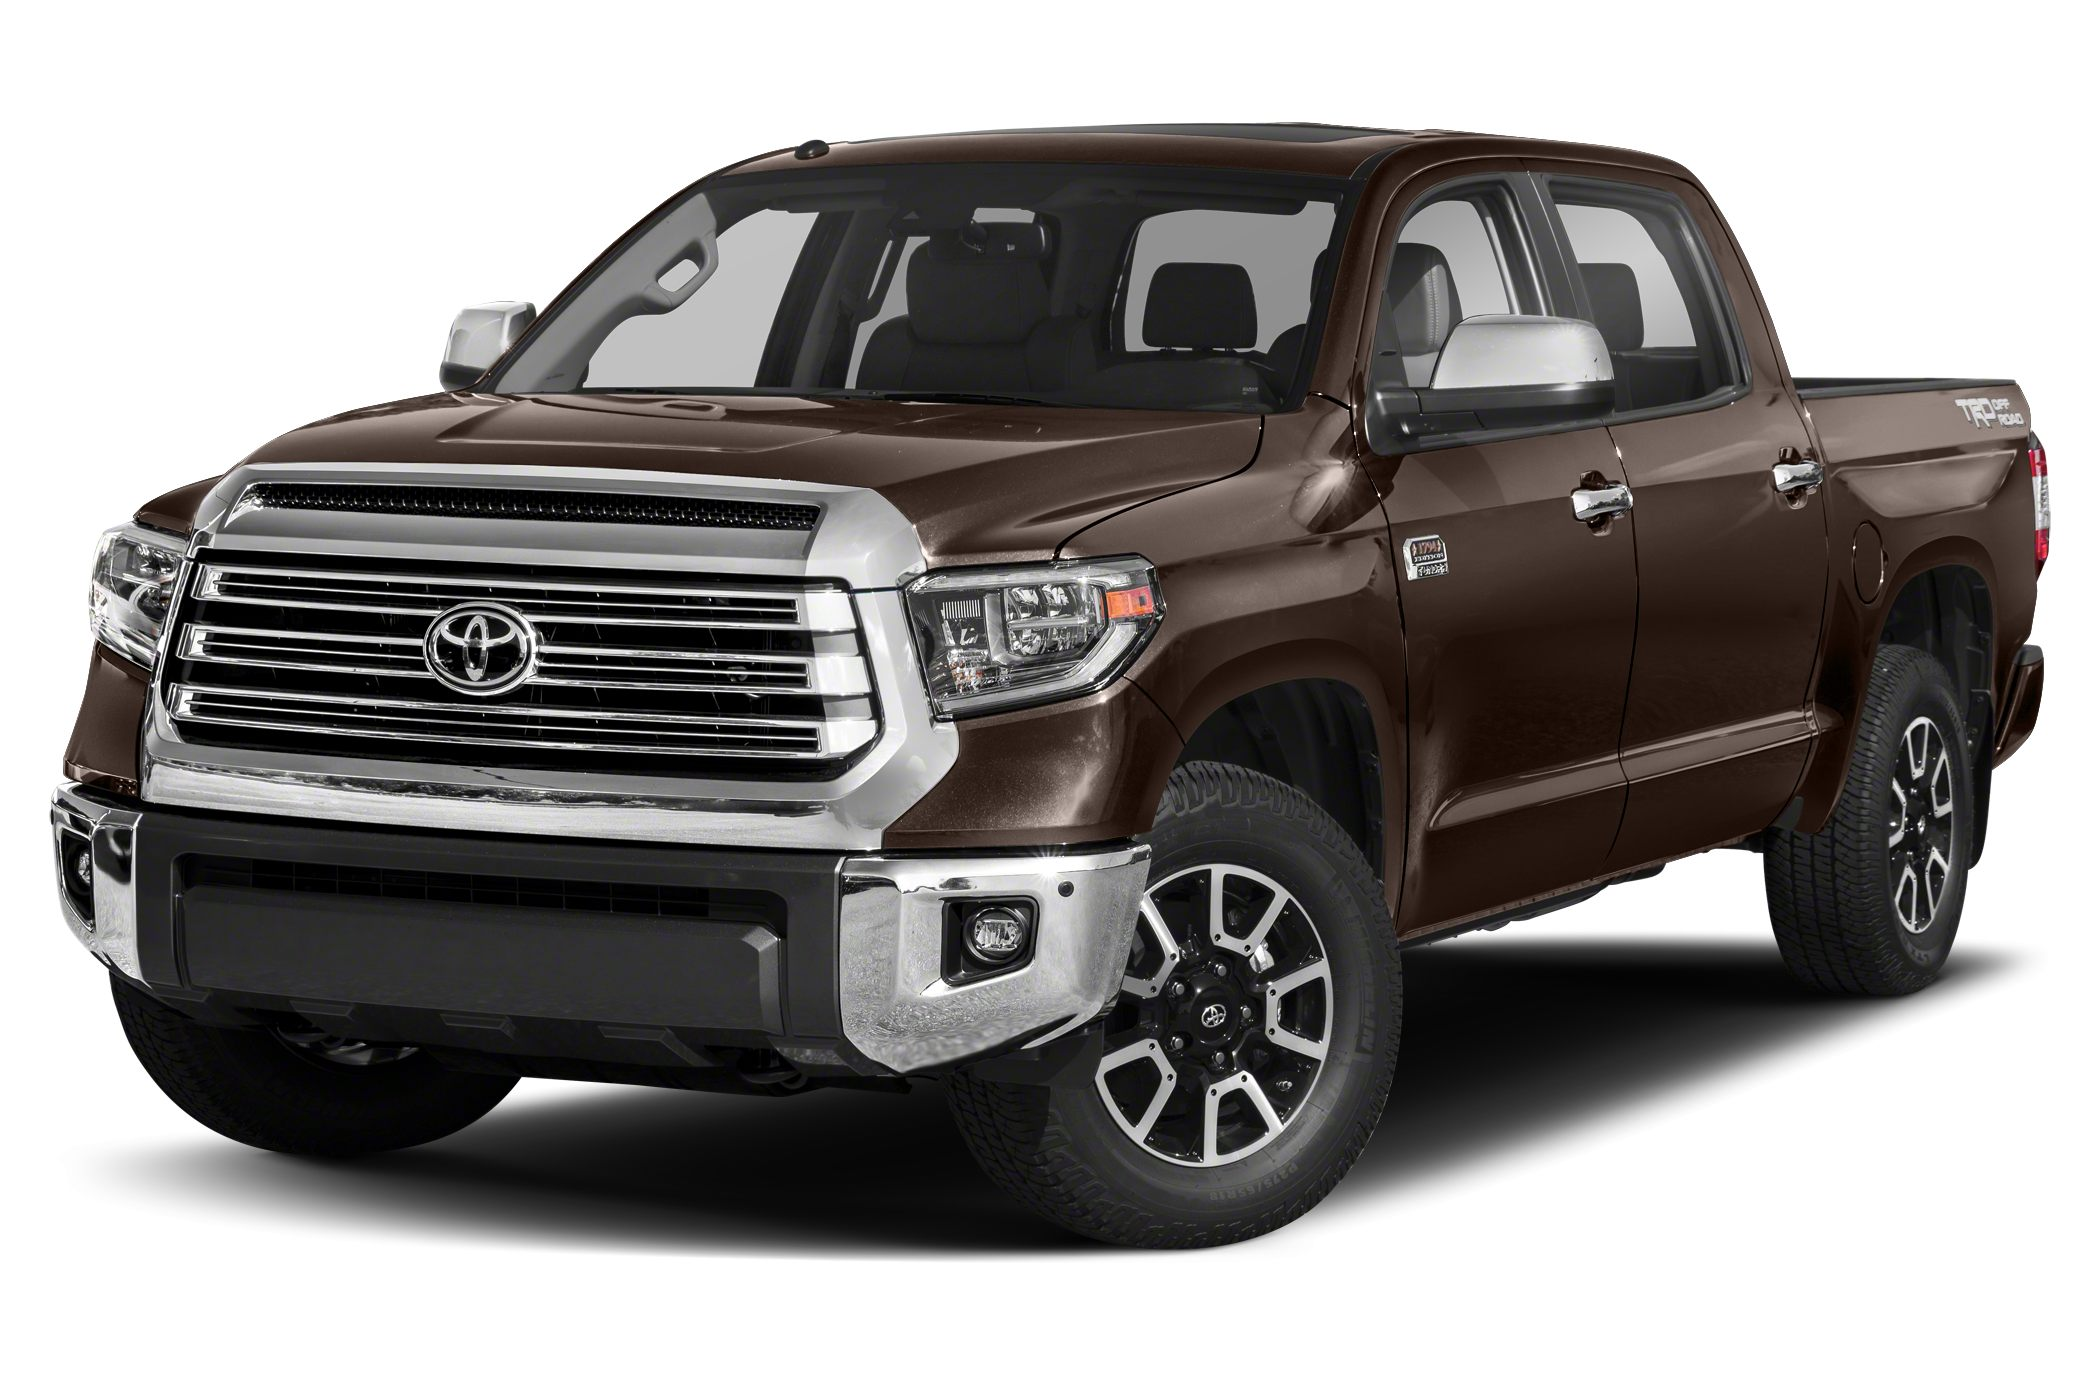 2018 Toyota Tundra 1794 5.7L V8 4x2 CrewMax 5.6 ft. box 145.7 in. WB